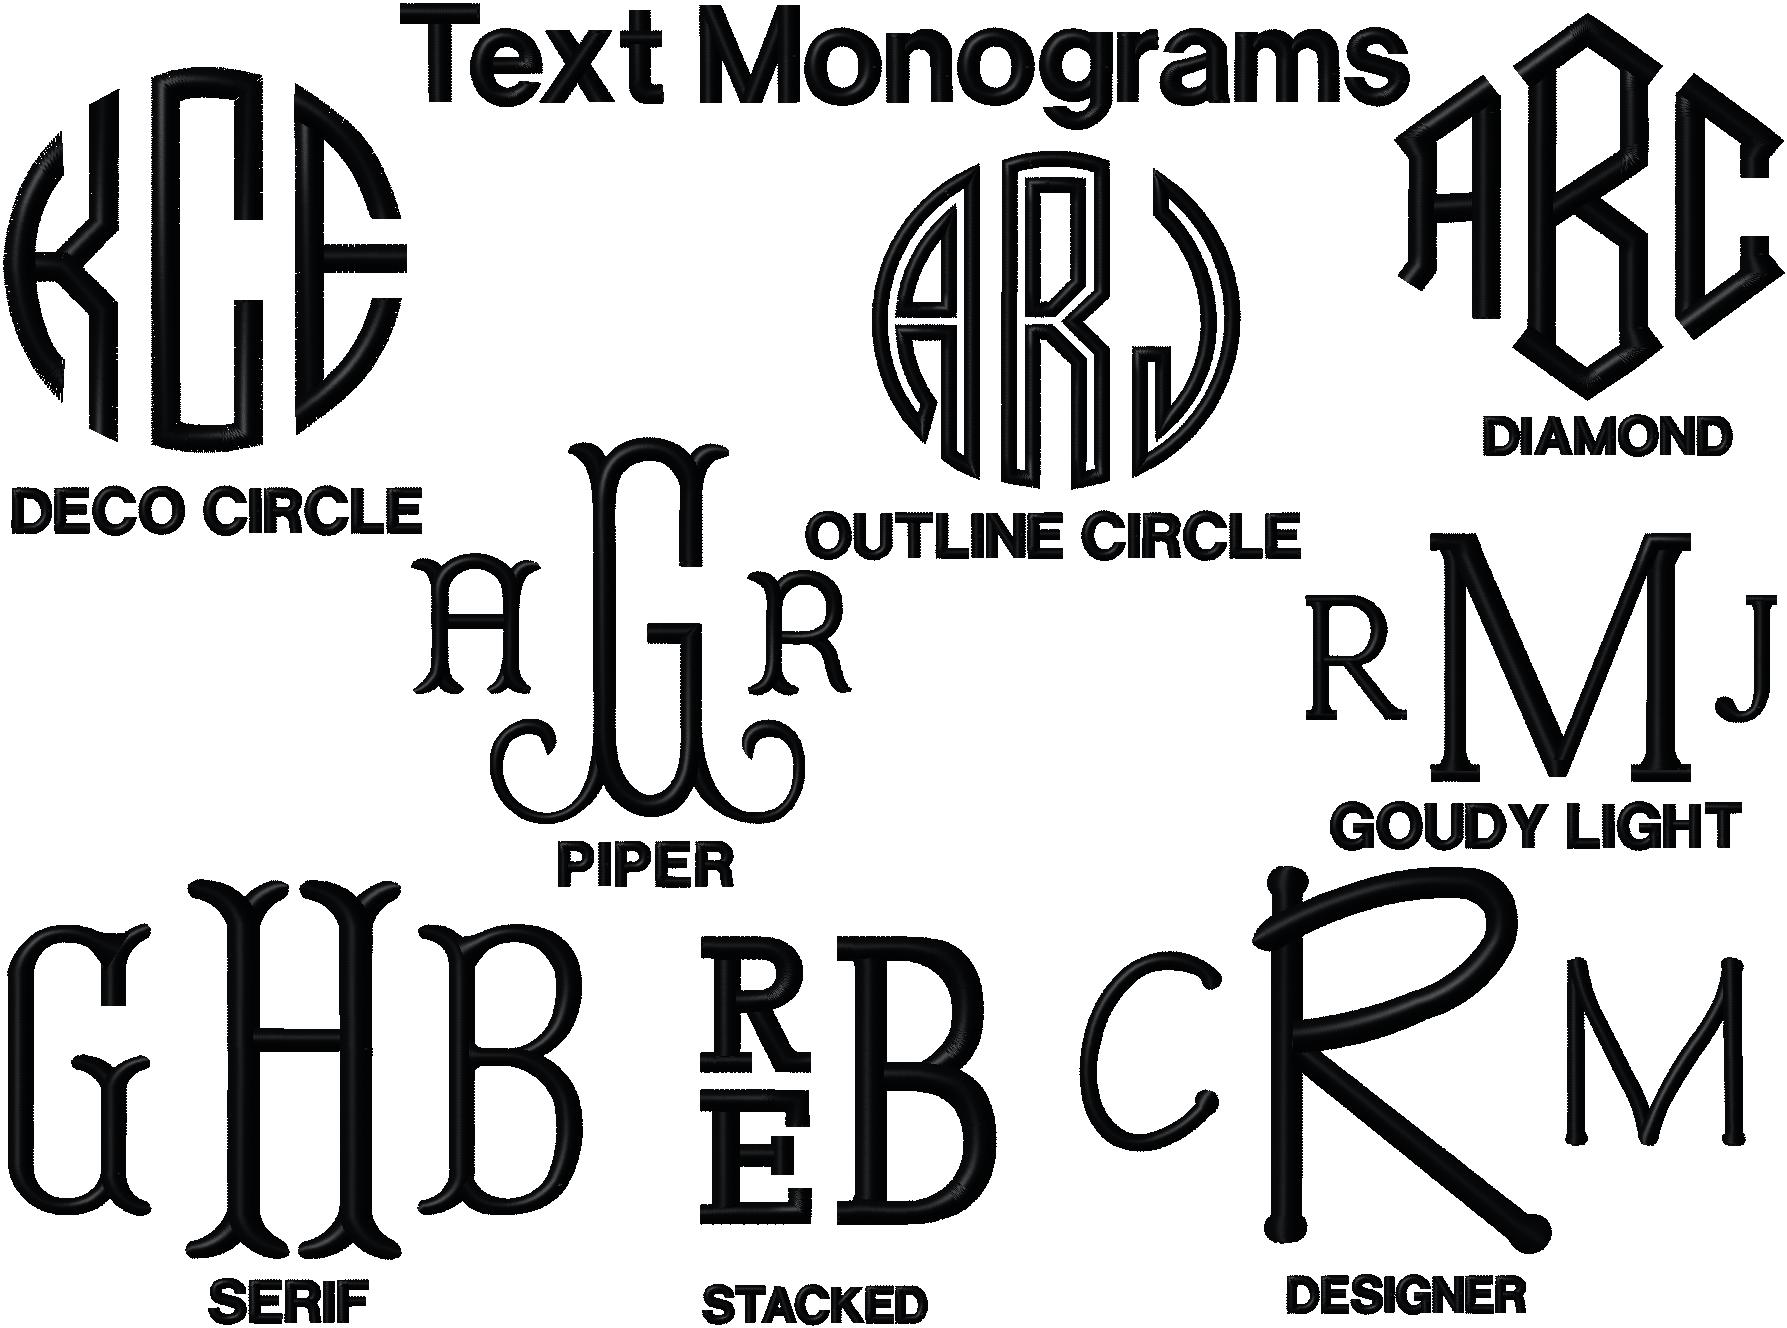 Board - TEXT MONOGRAMS APRIL 2016_PXF.PNG